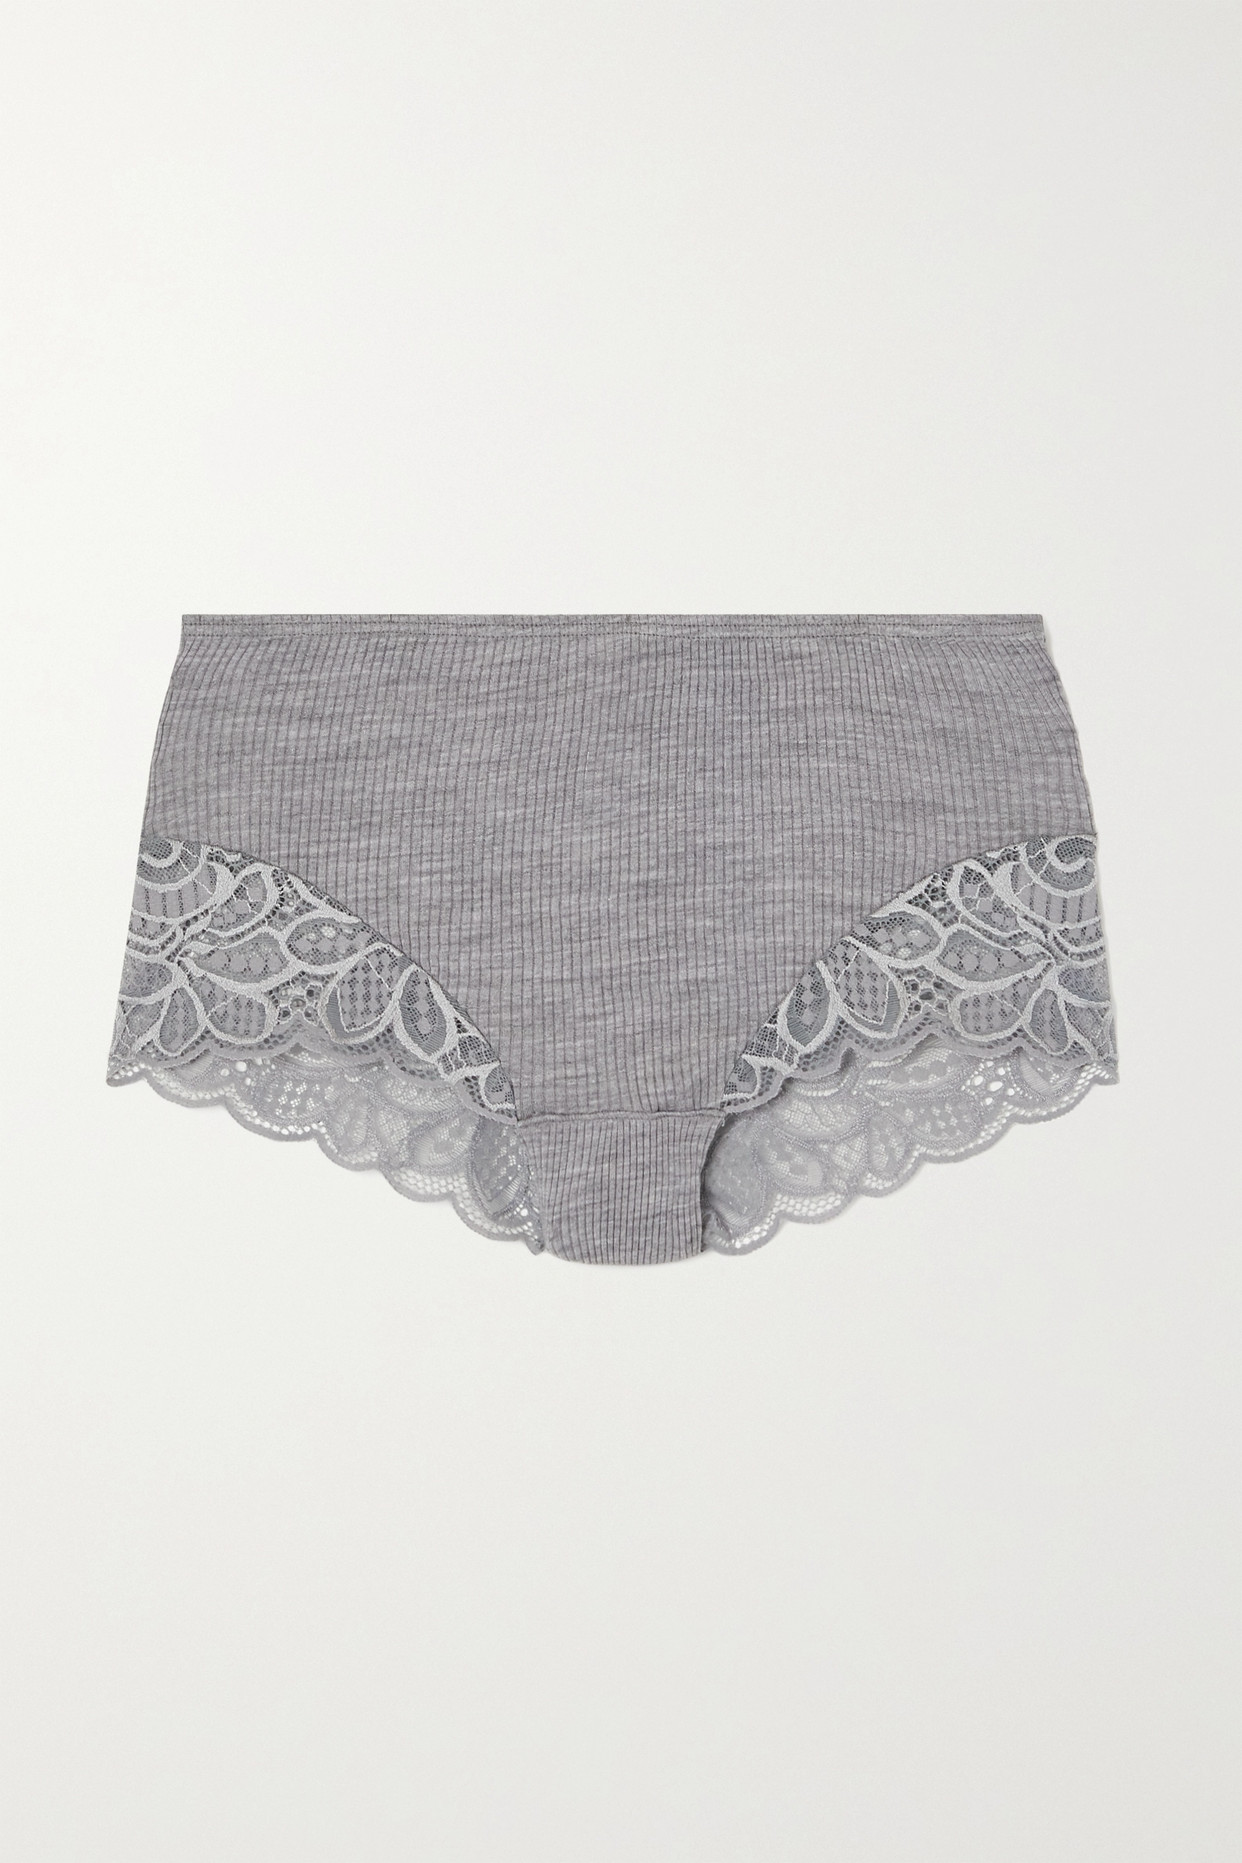 HANRO - Karla 蕾丝边饰罗纹羊毛真丝混纺三角裤 - 灰色 - large